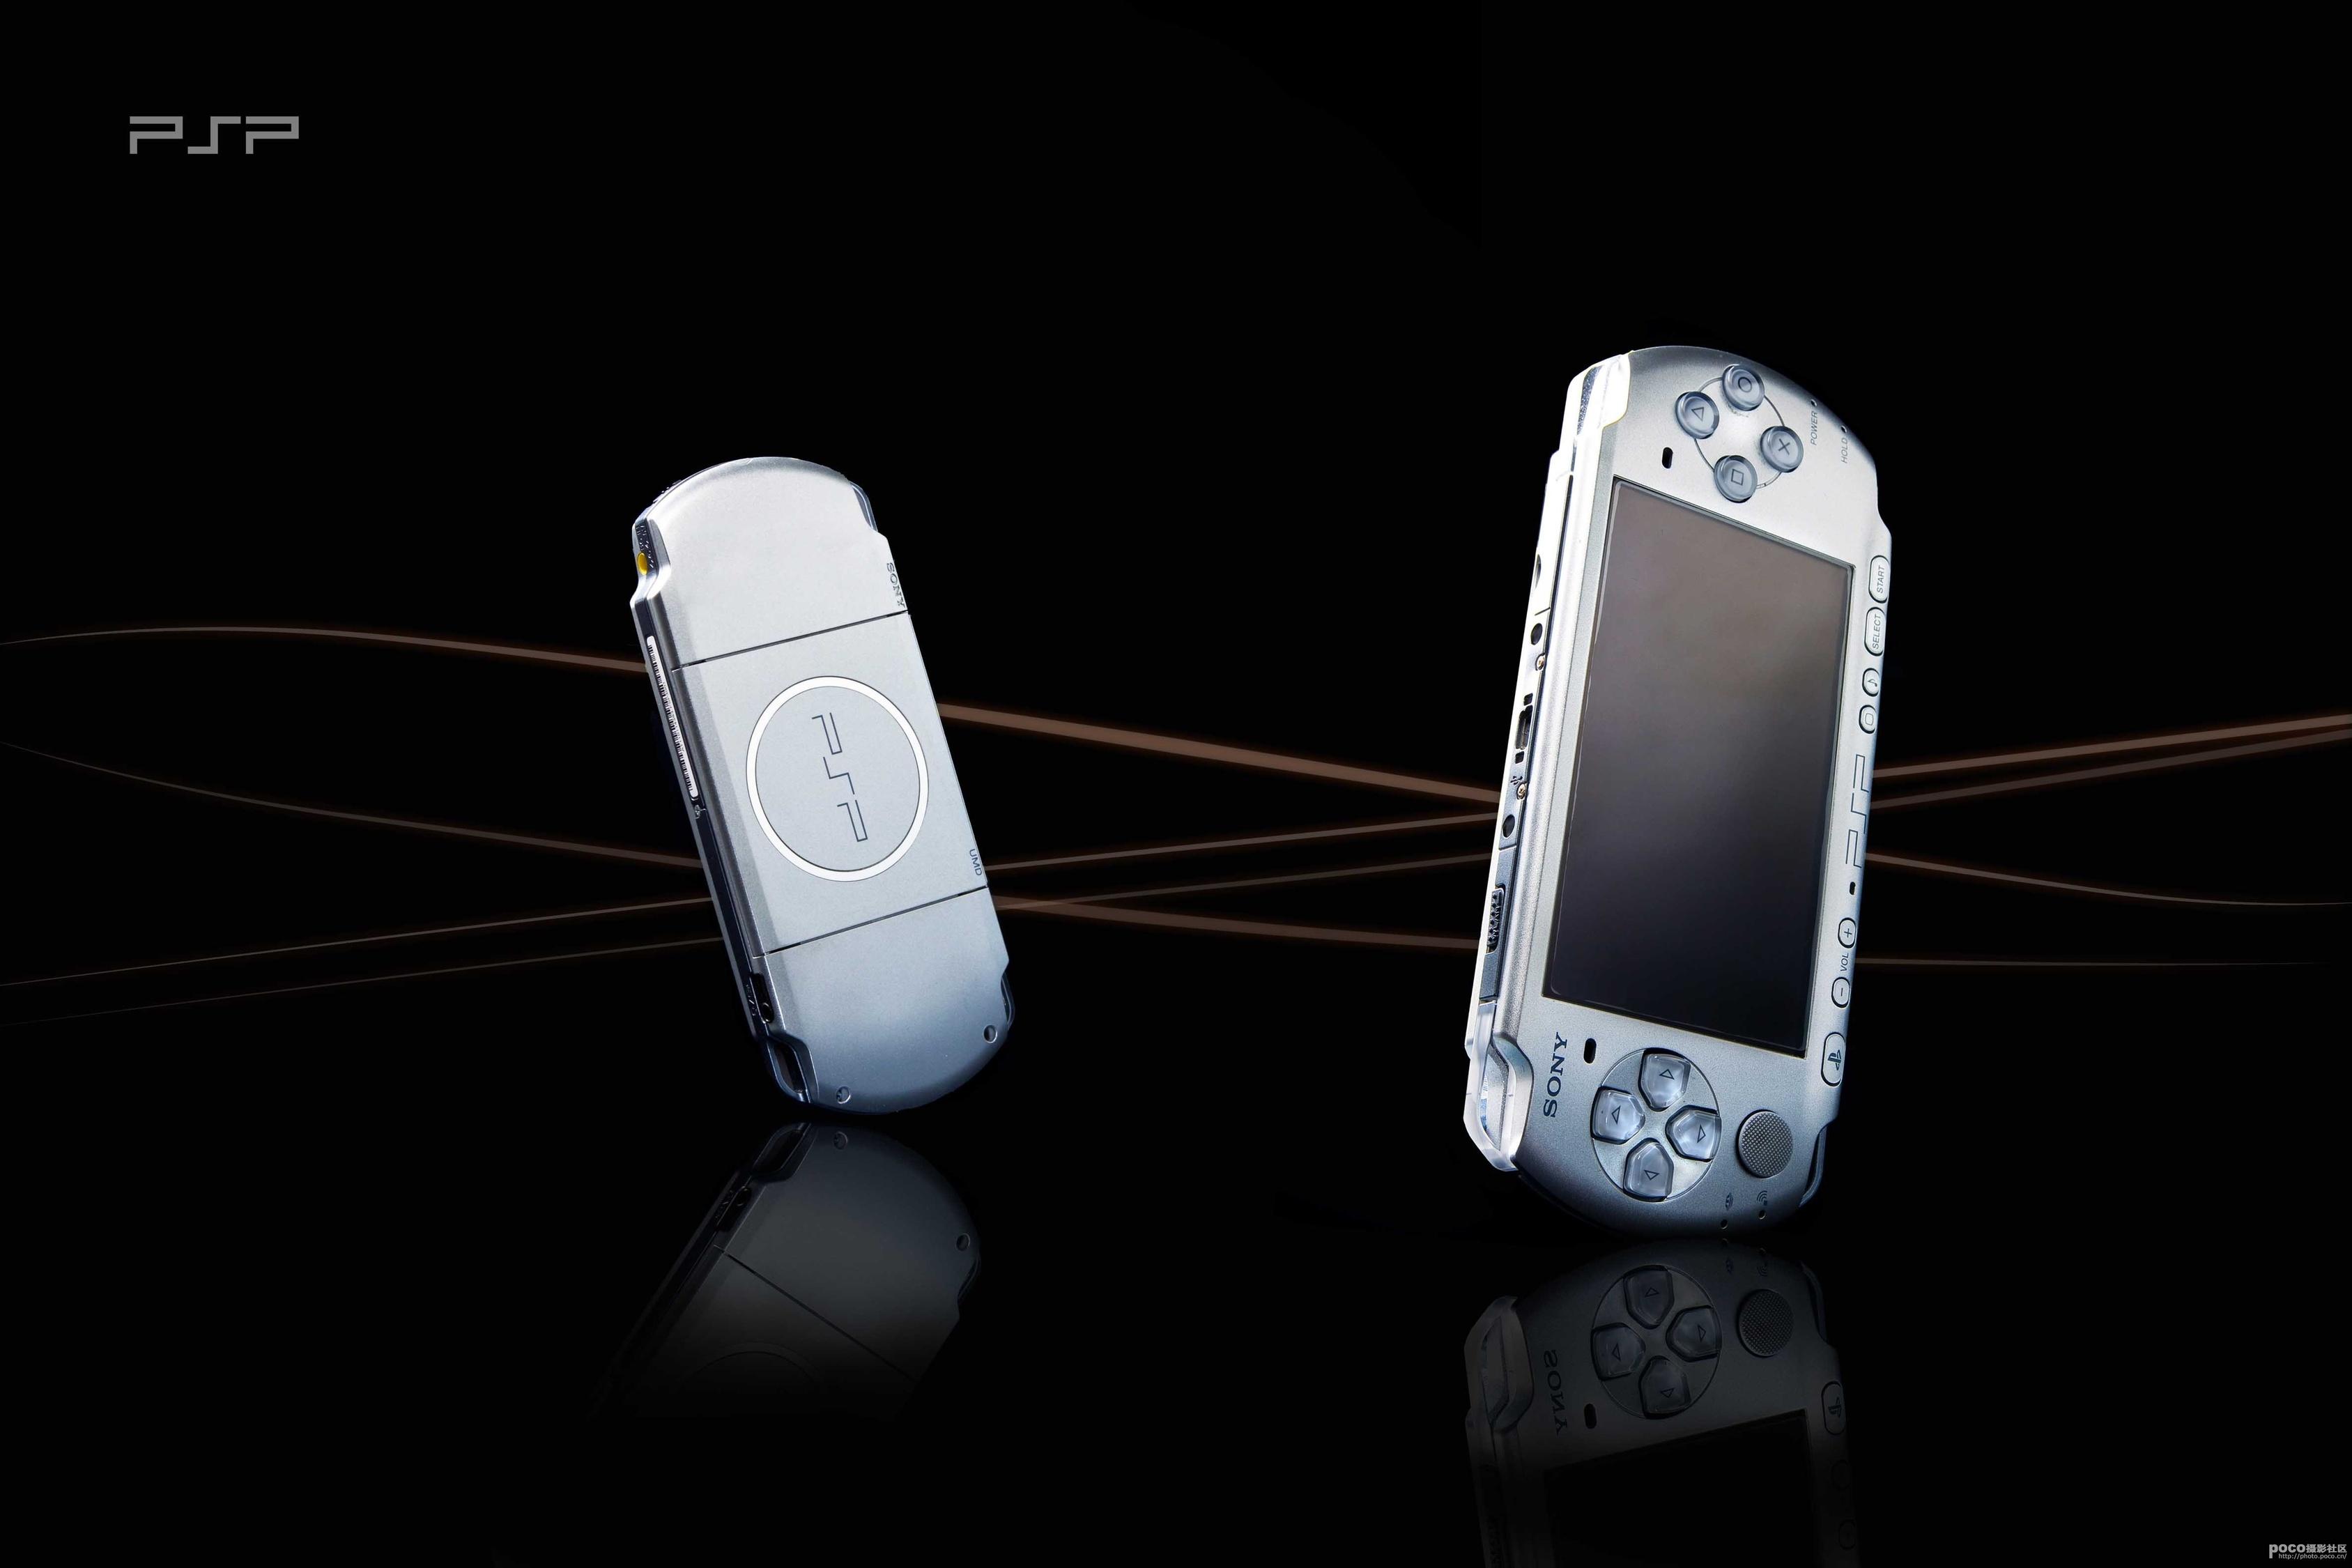 PSP回憶錄:21世紀的WALKMAN